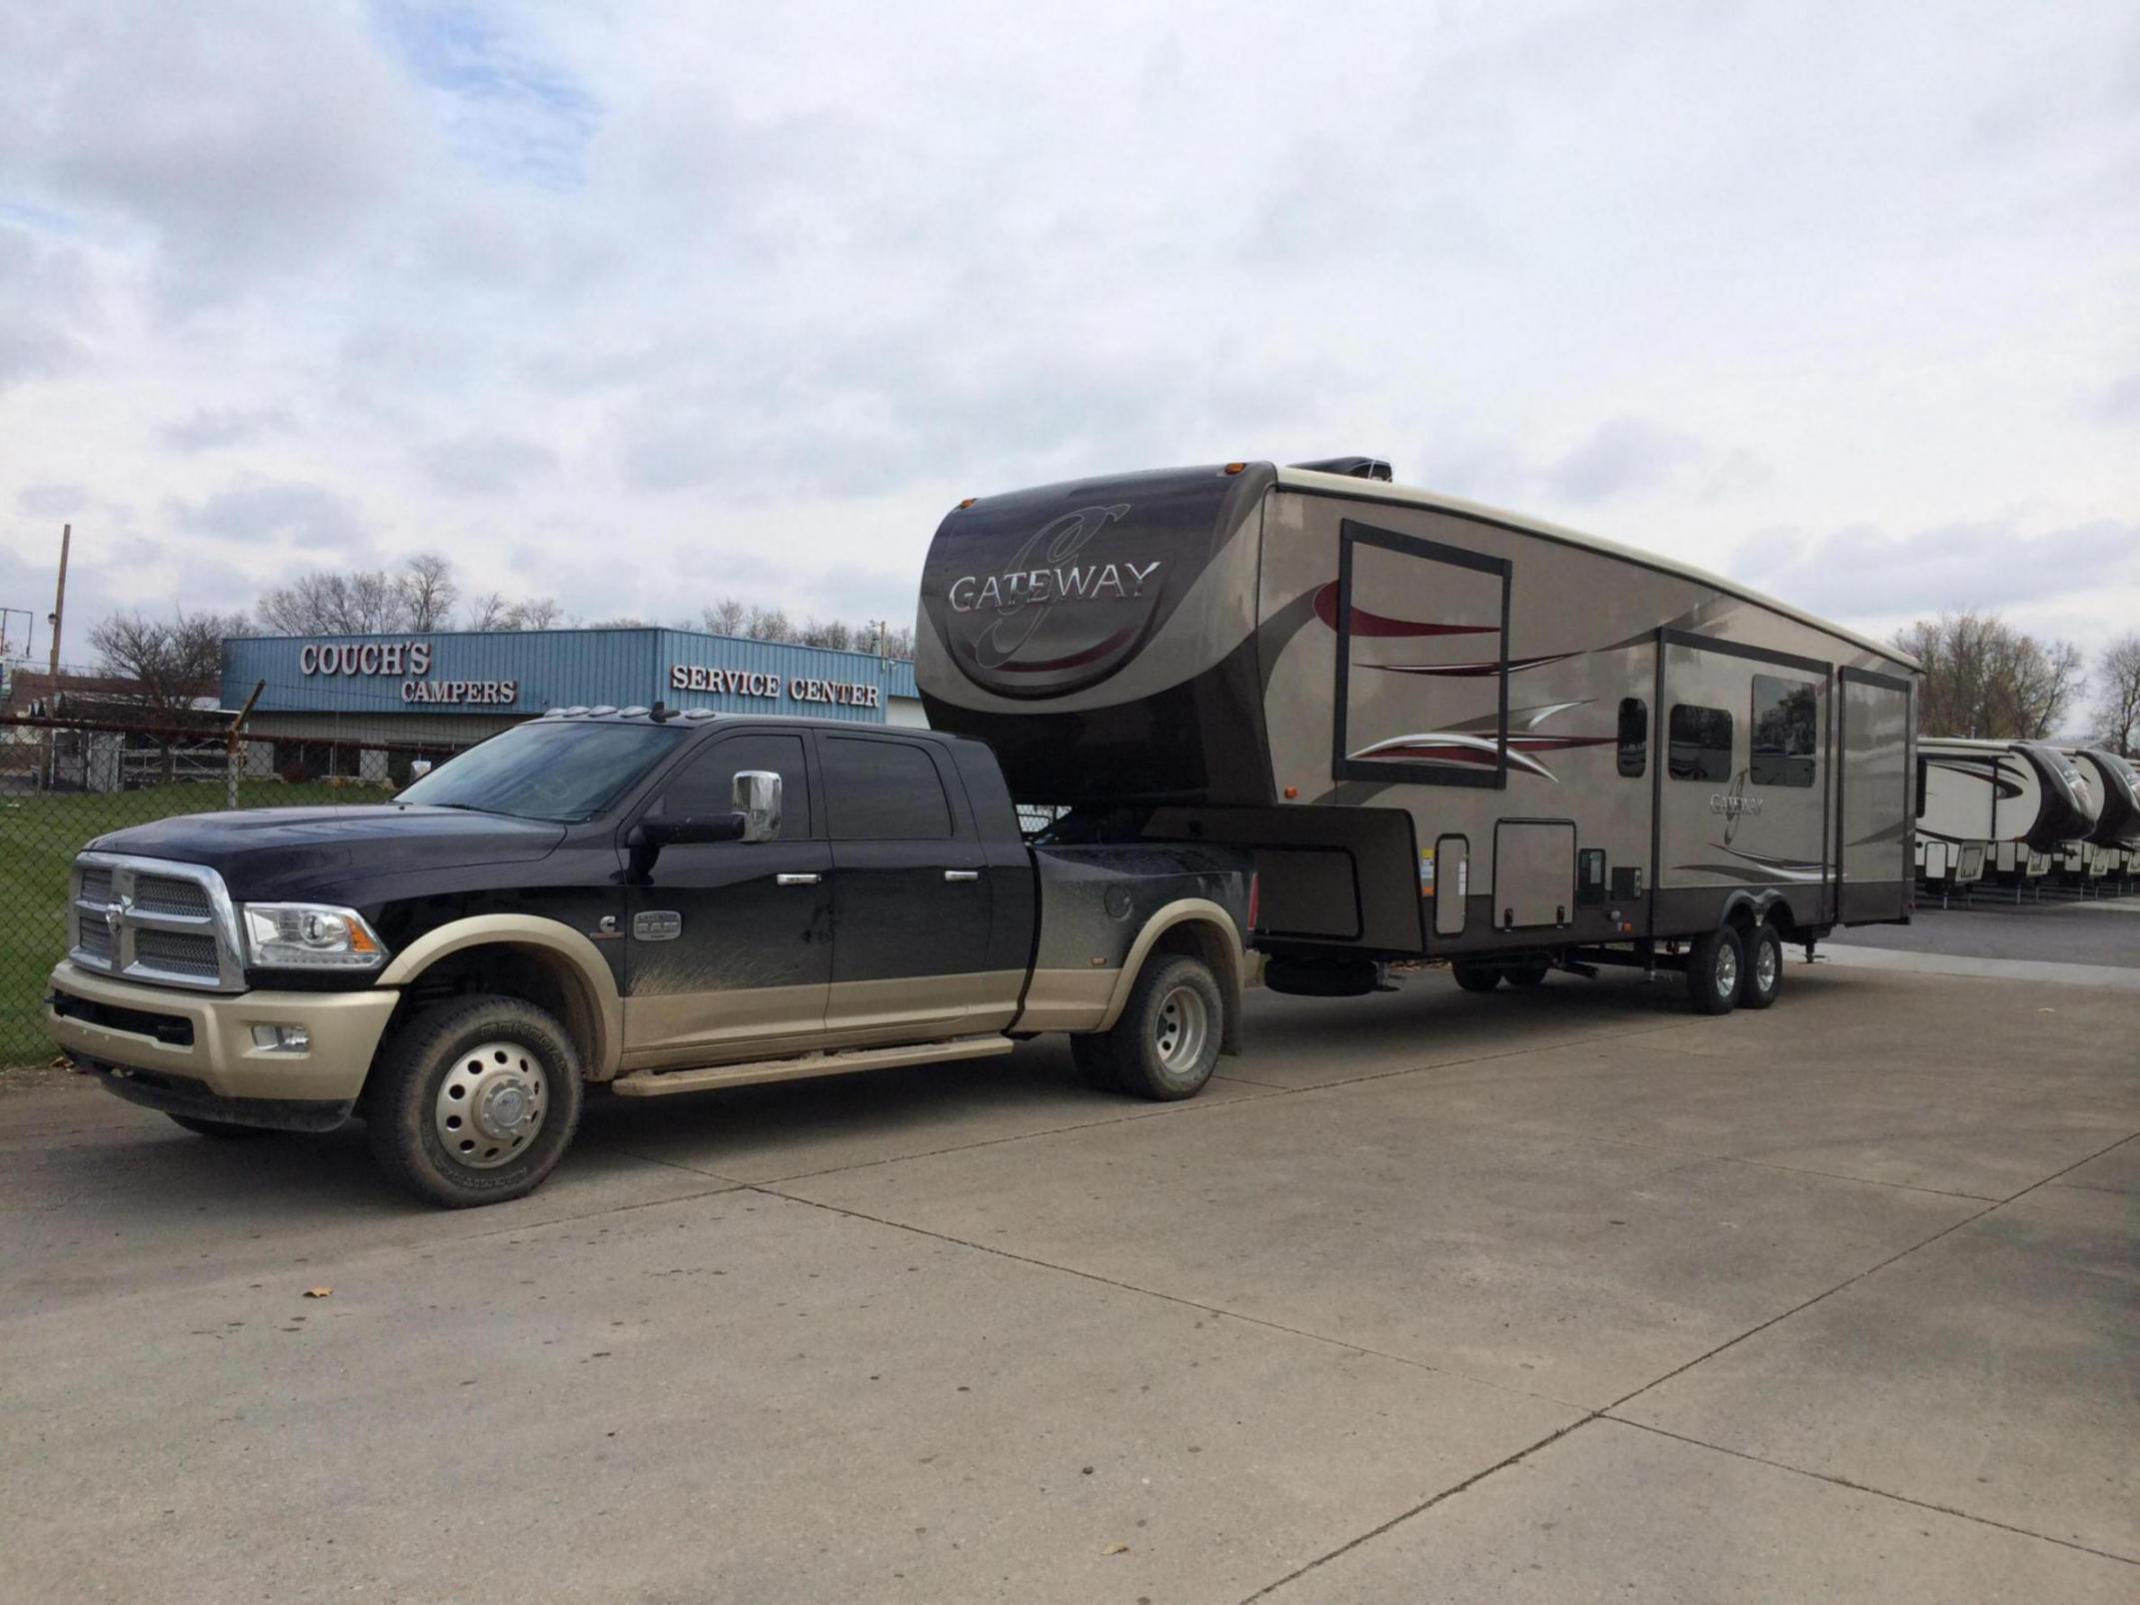 Dually Short Bed >> UPDATE: Towing 5th wheel w/ Megacab shortbed - Dodge Cummins Diesel Forum